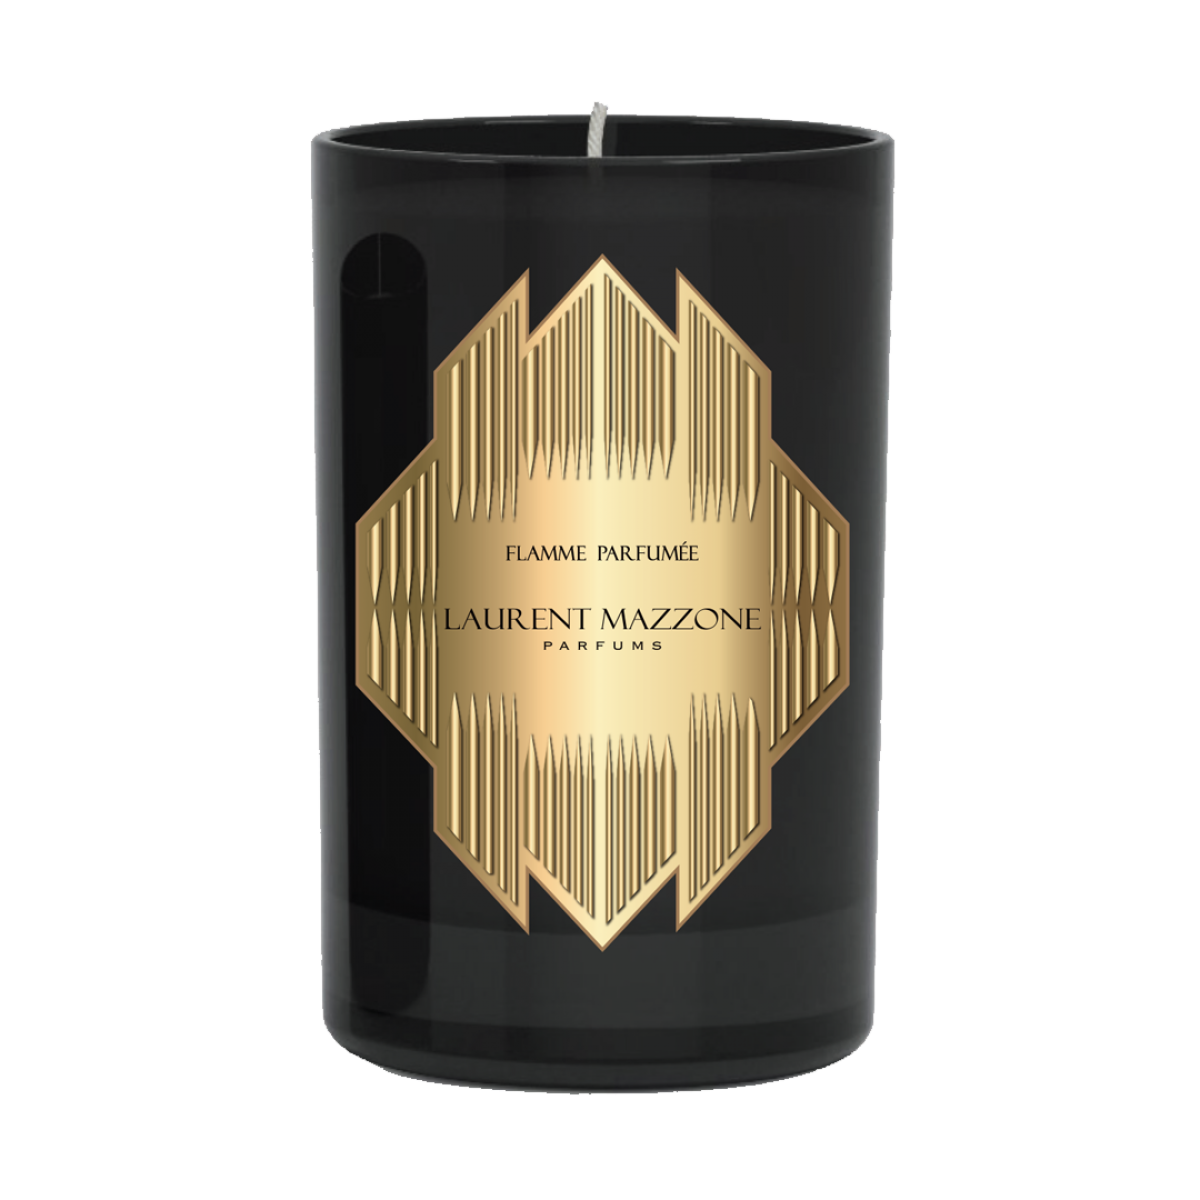 FLAMME PARFUMEE VELENO DORE - LM Parfums